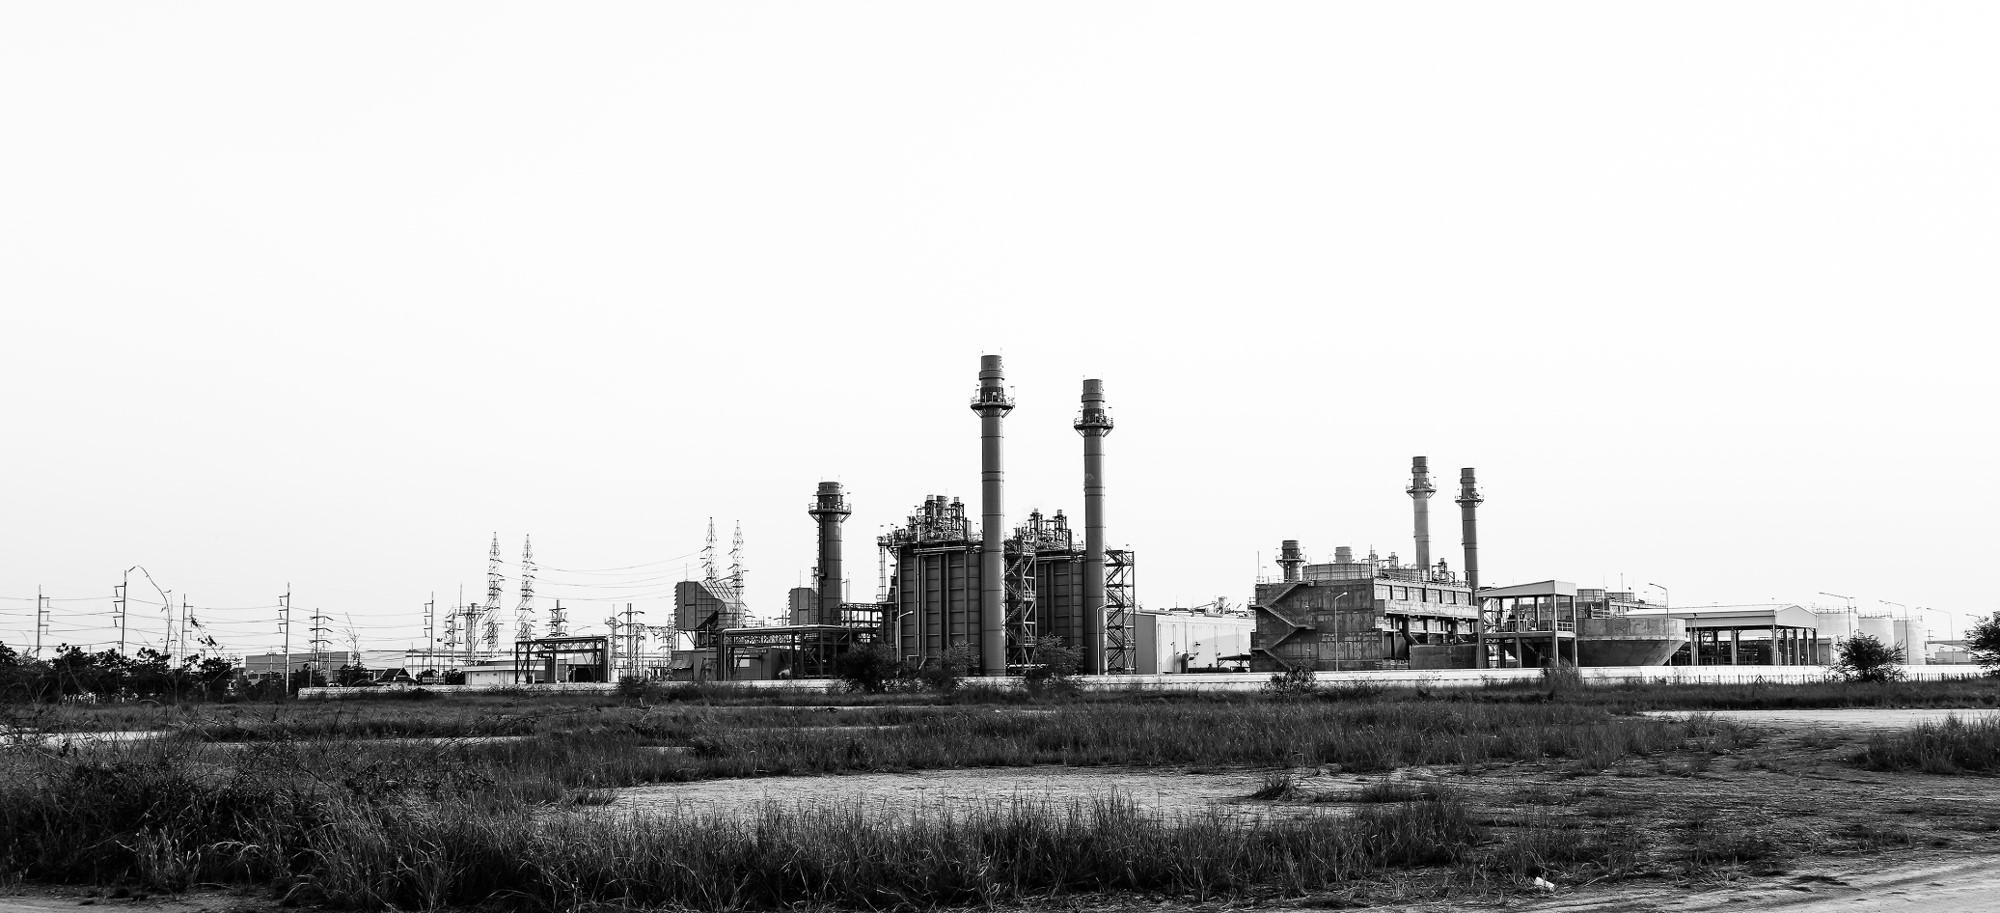 ETN Hytrogen Gas Turbines – 04 Retrofit of Existing Gas Turbines